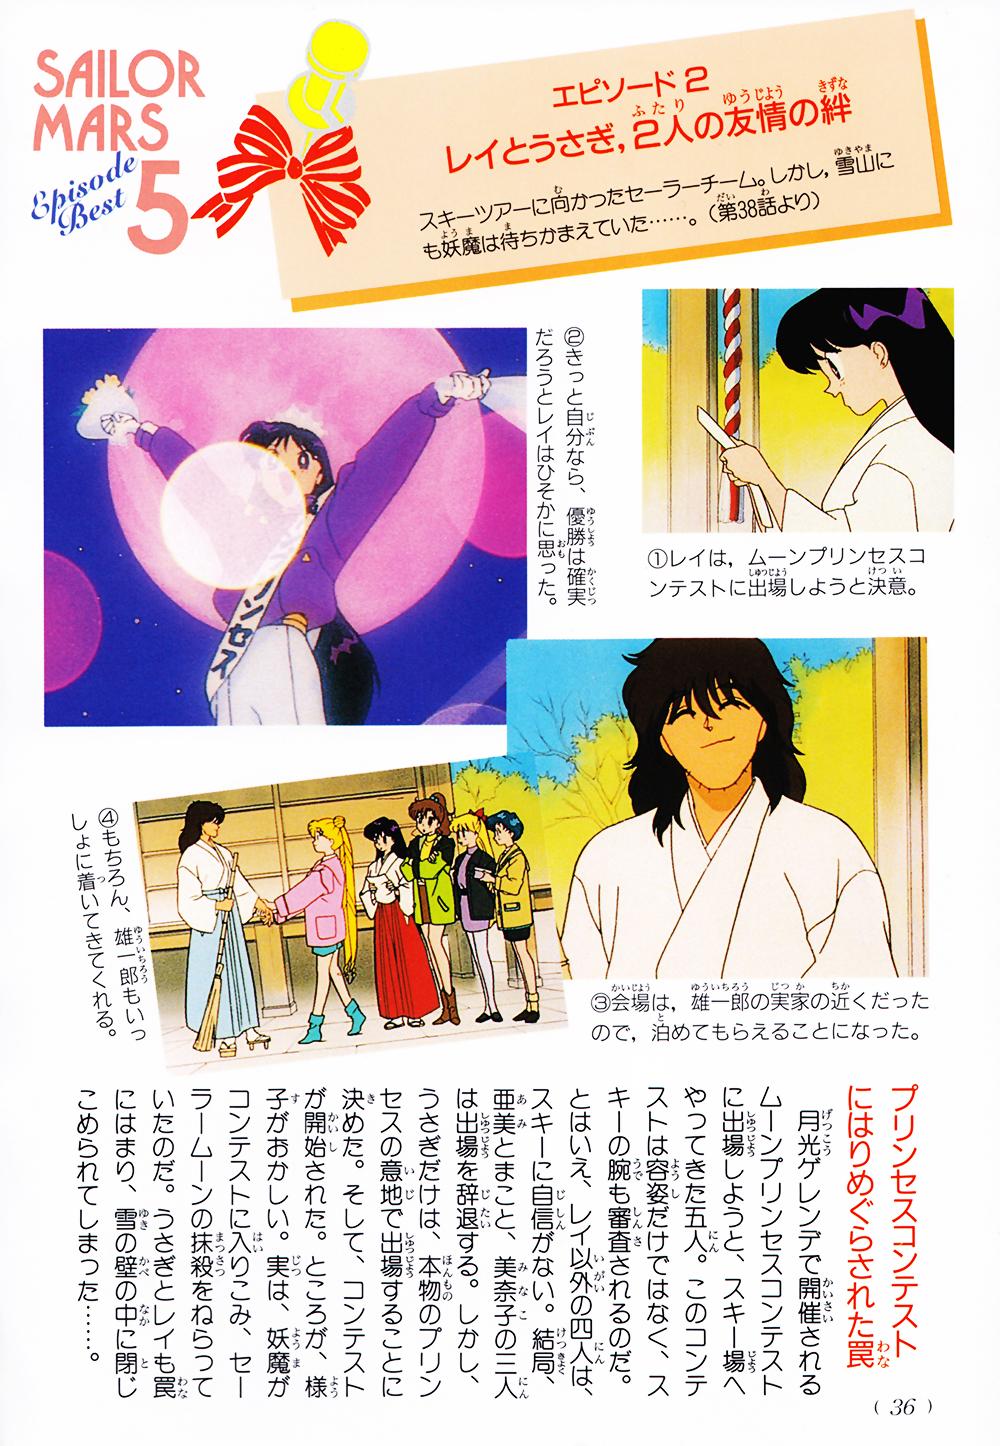 Sailor_mars_fanbook_35